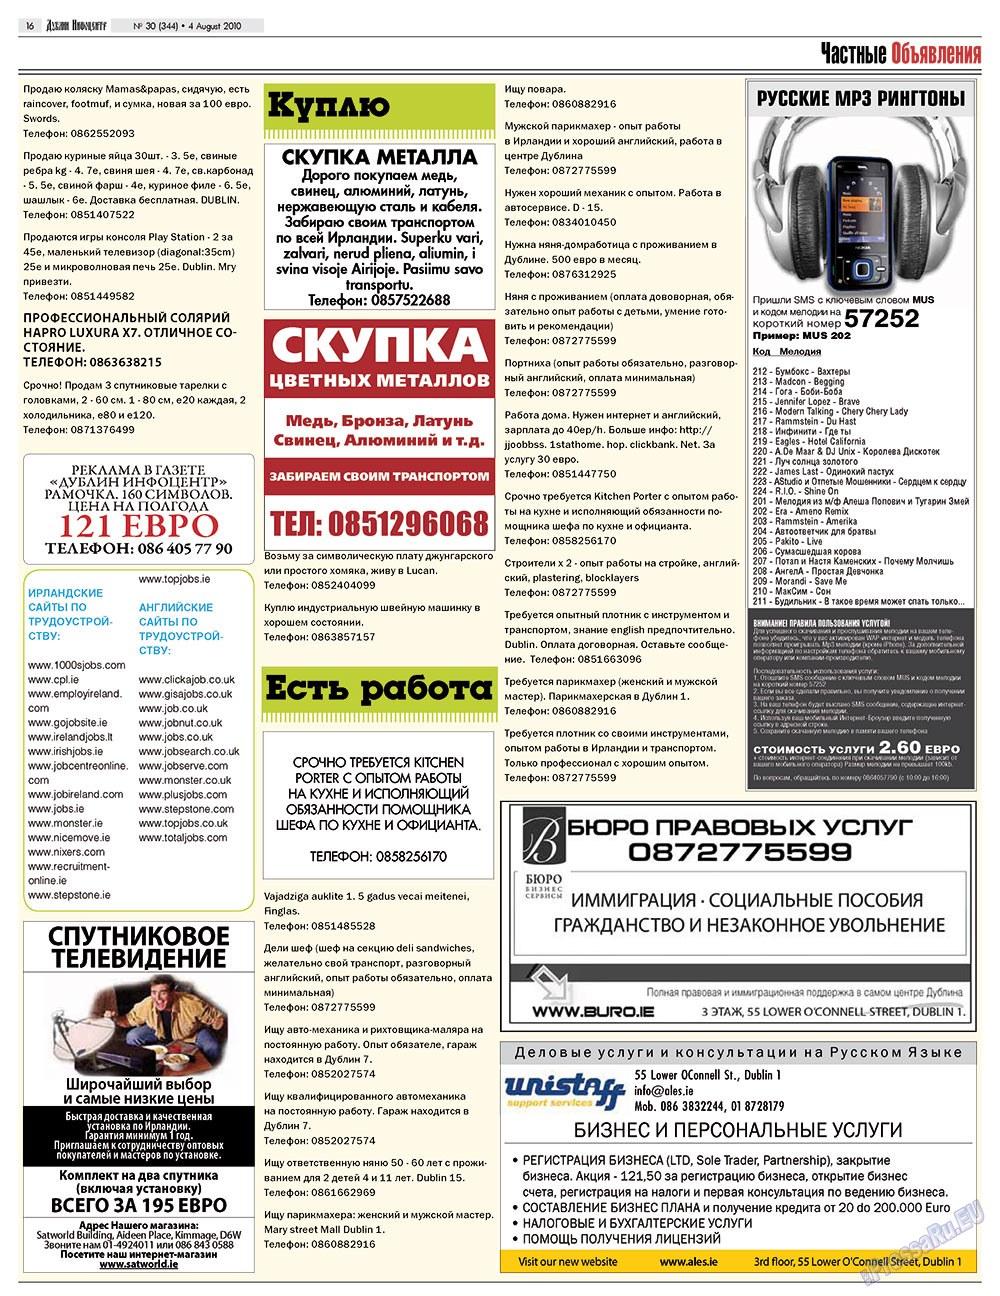 Дублин инфоцентр (газета). 2010 год, номер 30, стр. 16